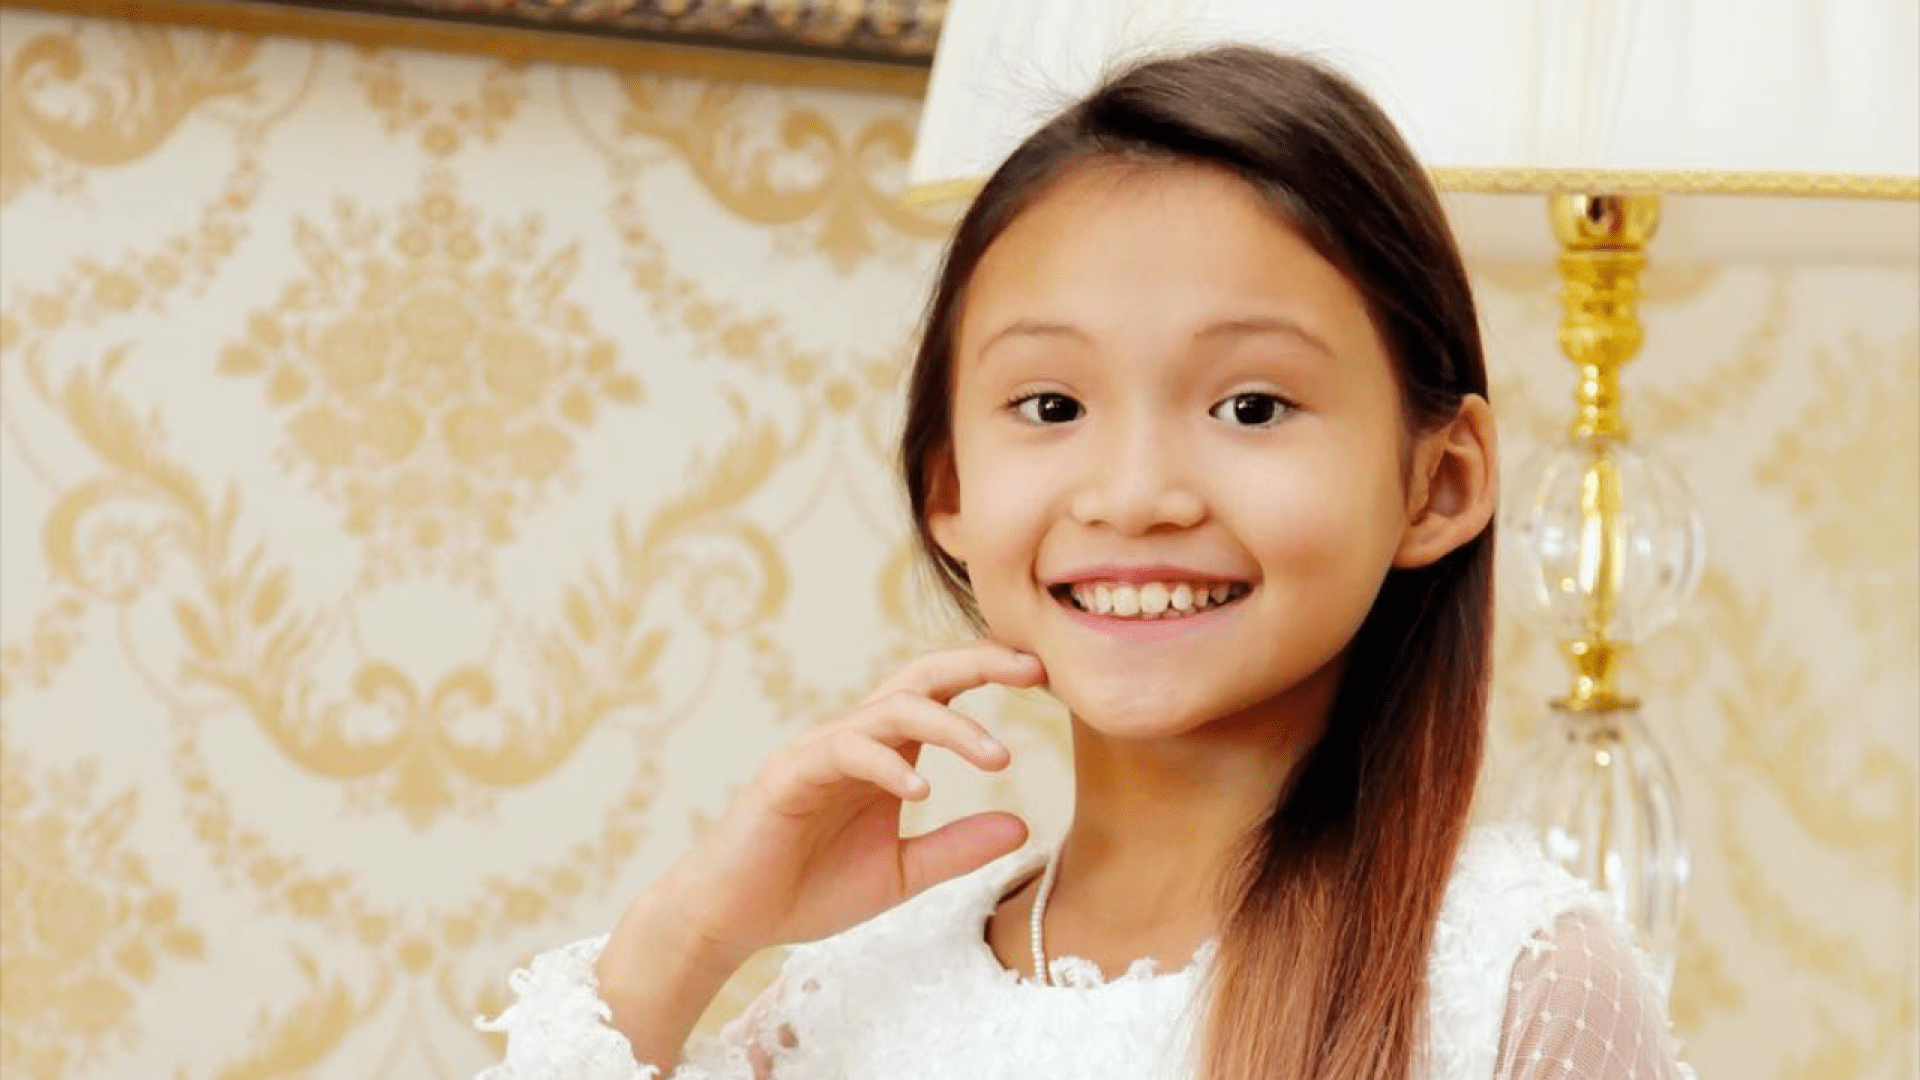 Saniya Zholzhaxynova, Kazakhstan. Image source: Kaznews.kz